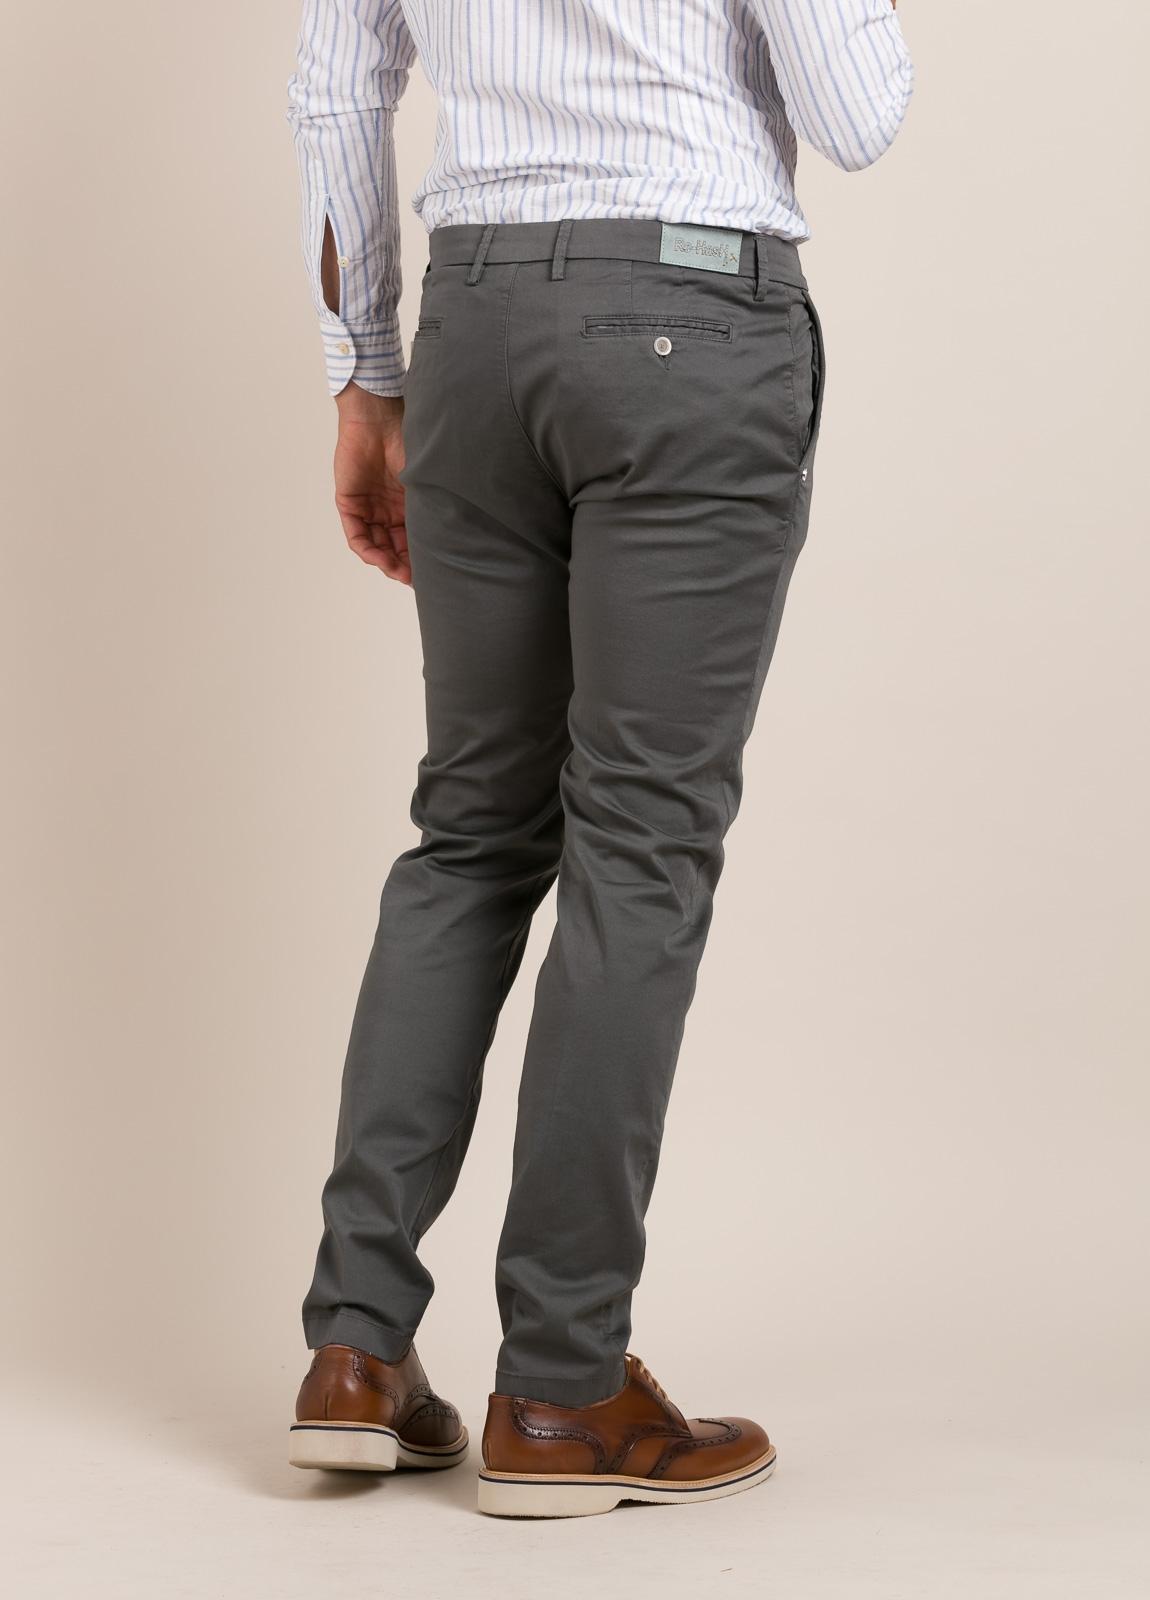 Pantalón sport RE-HASH slim fit gris - Ítem1